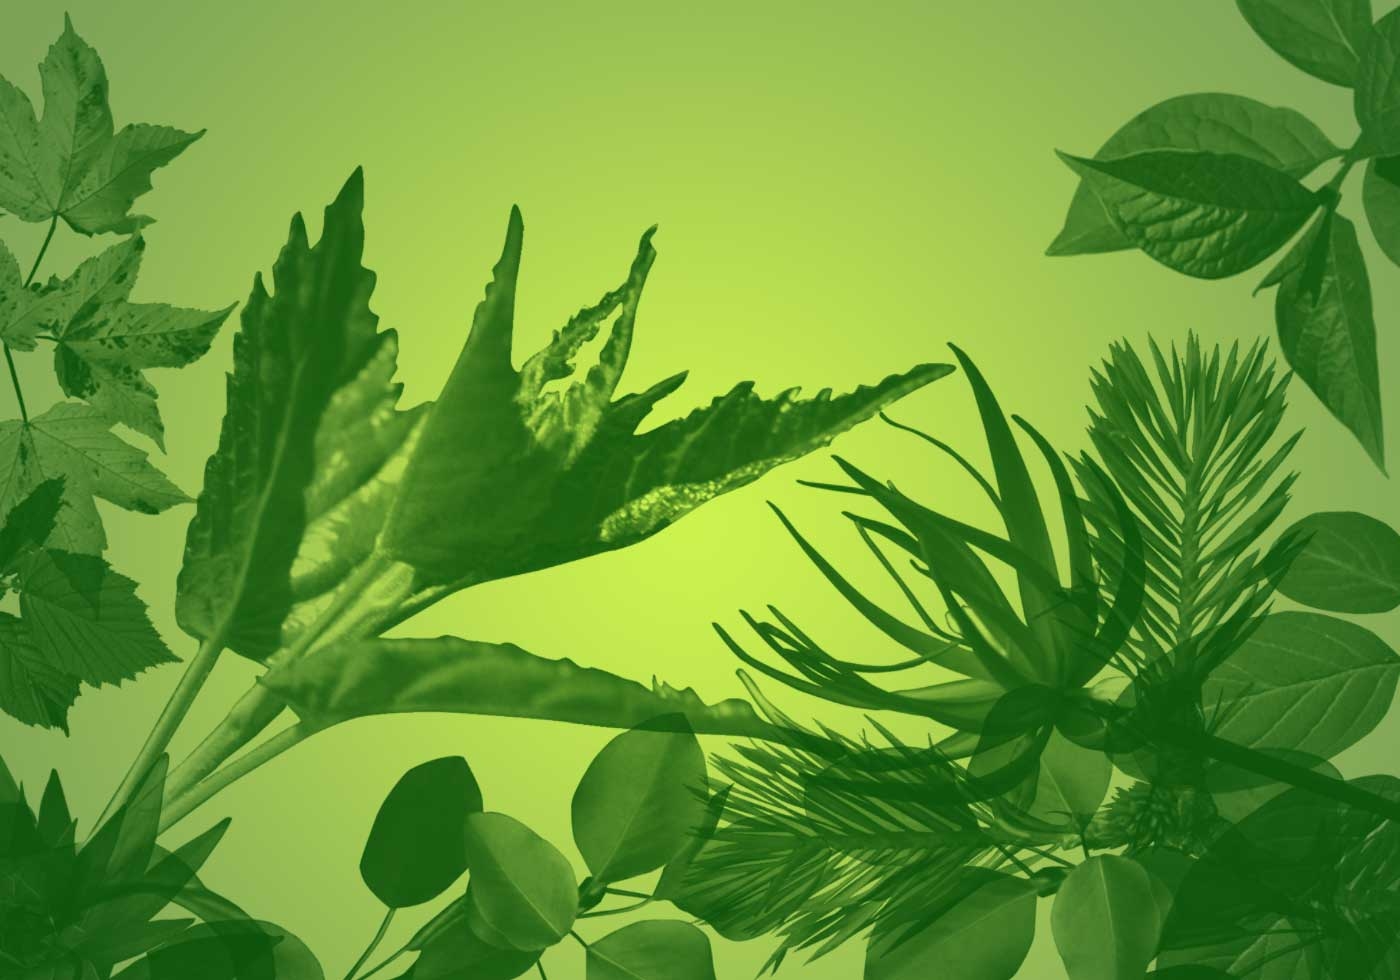 Vine Leaf Paint Brush Photoshop